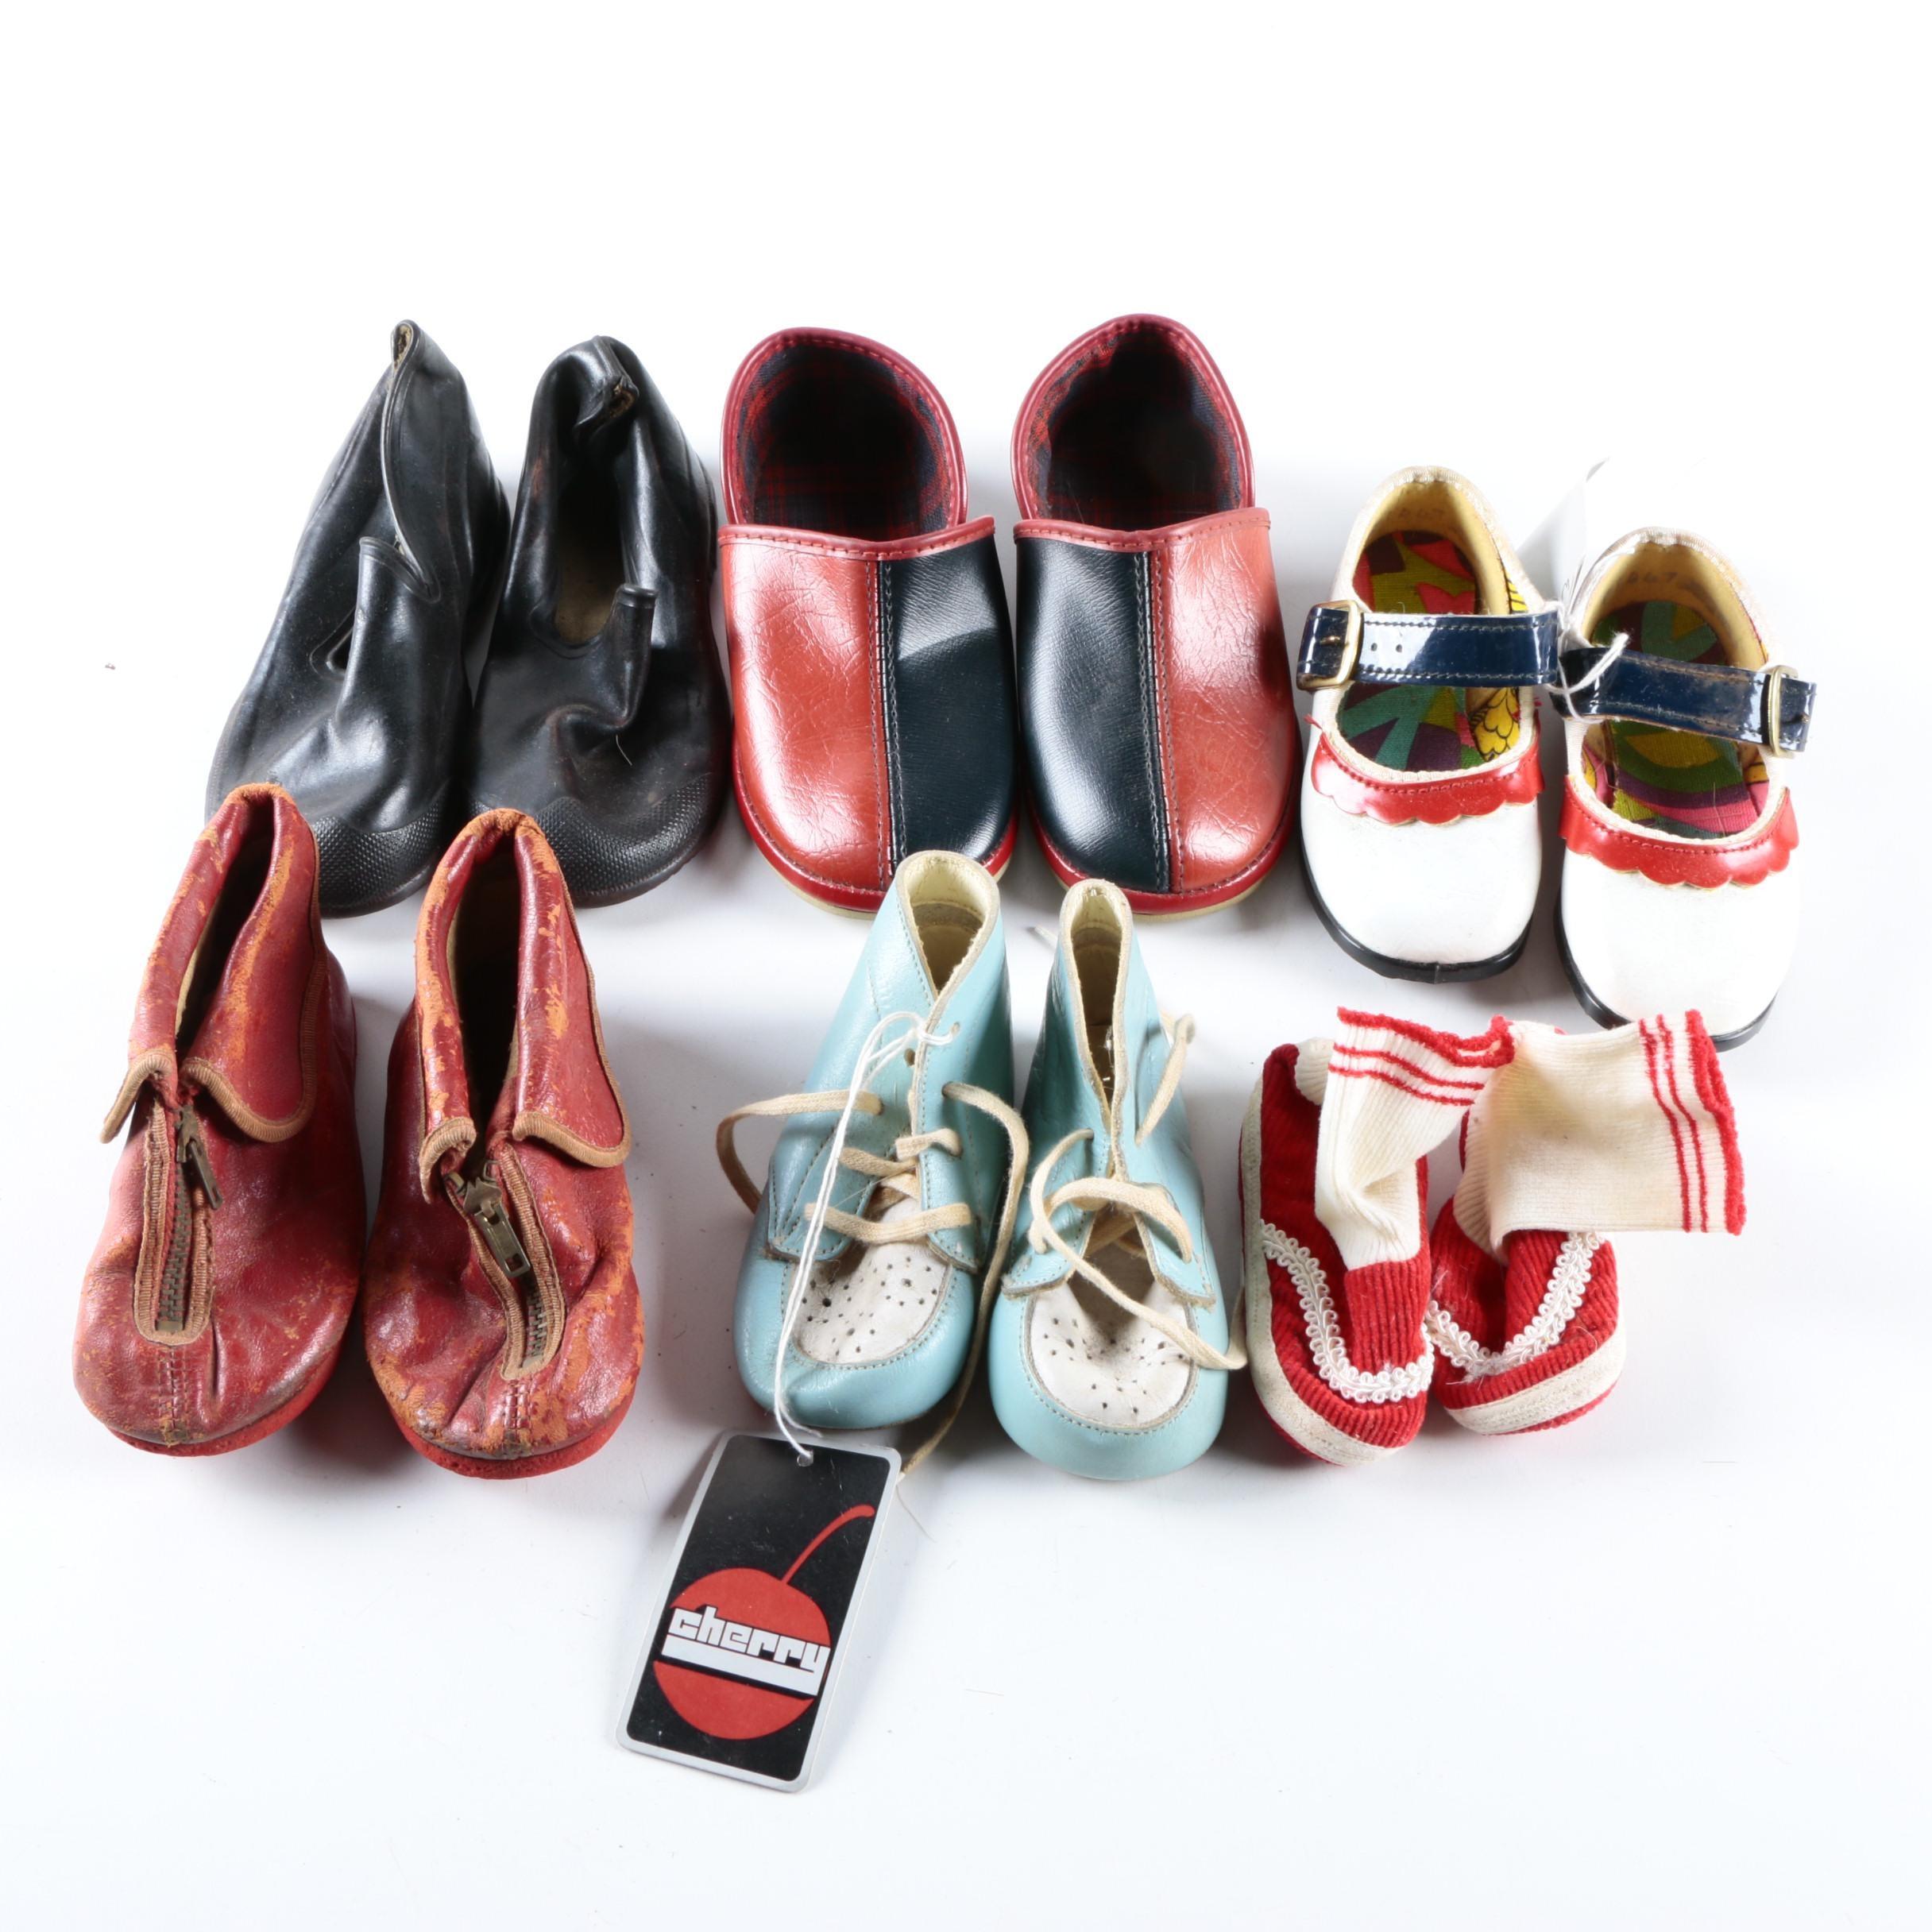 1940s & 1950s Children's Vintage Footwear Including Beacon Falls